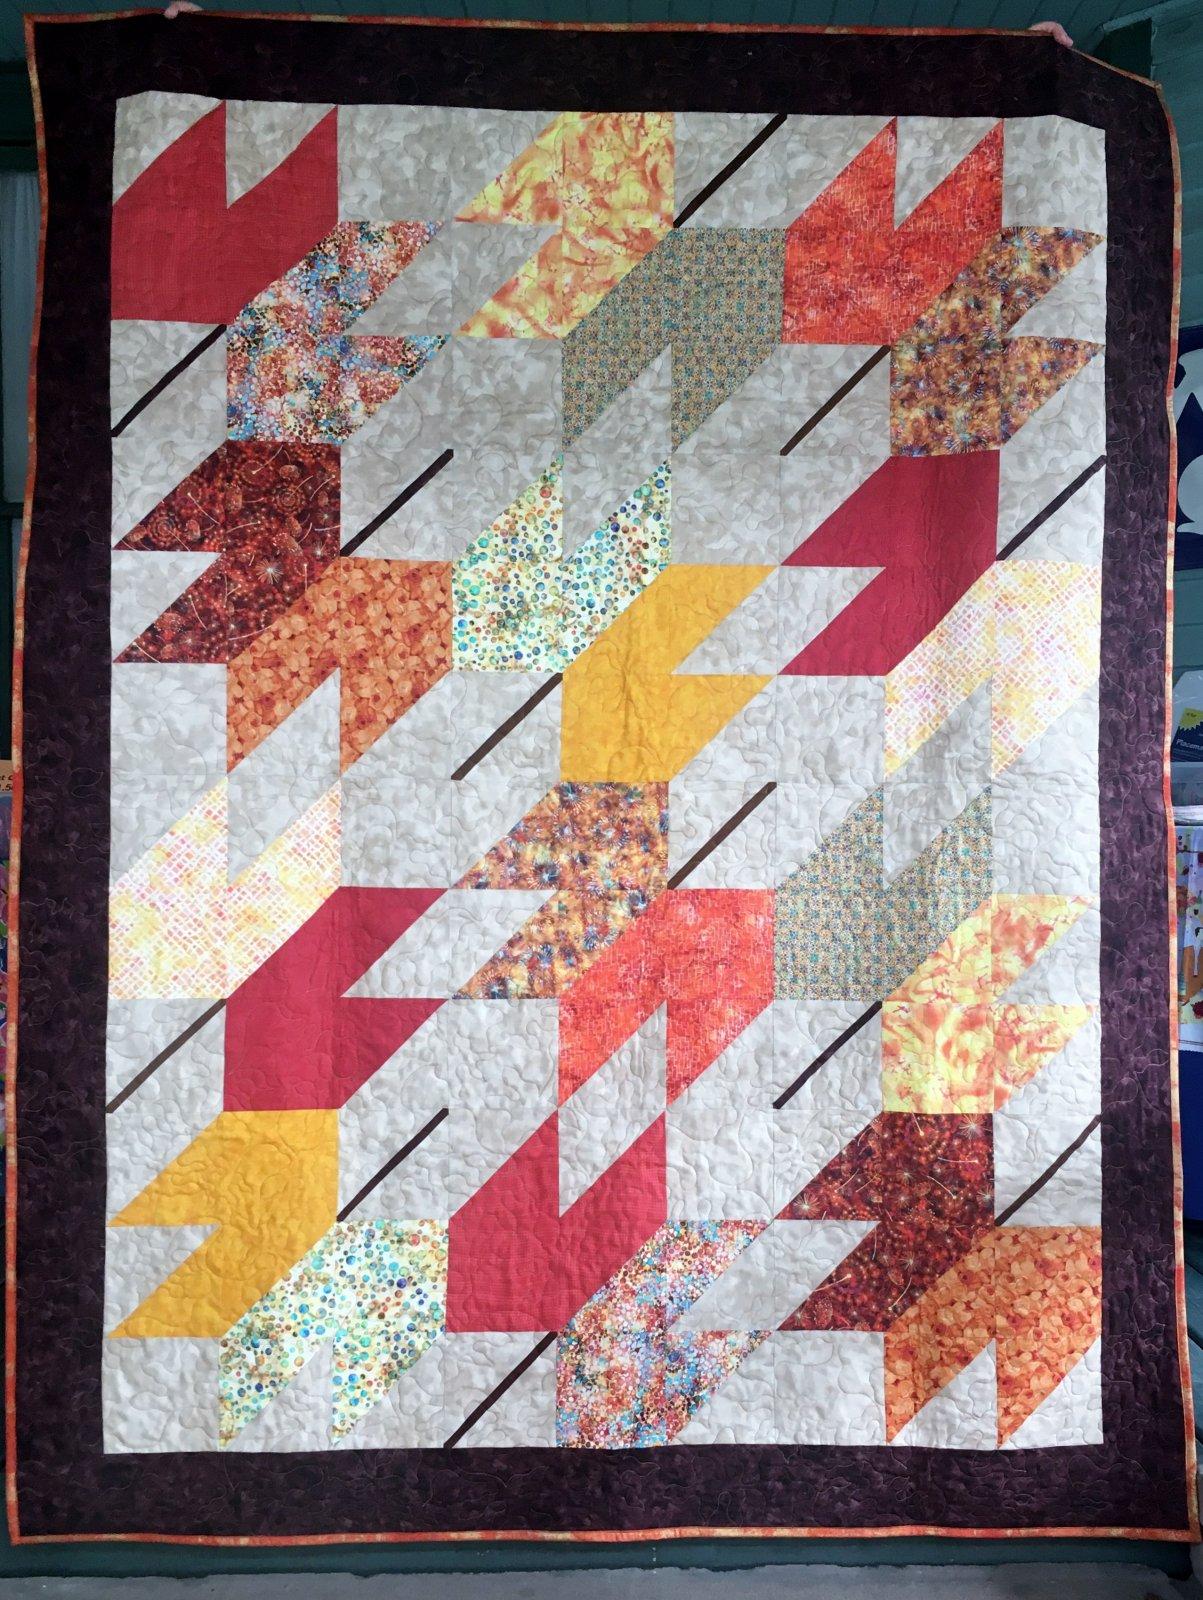 Falling Autumn Leaf Quilt Kit 63 x 81